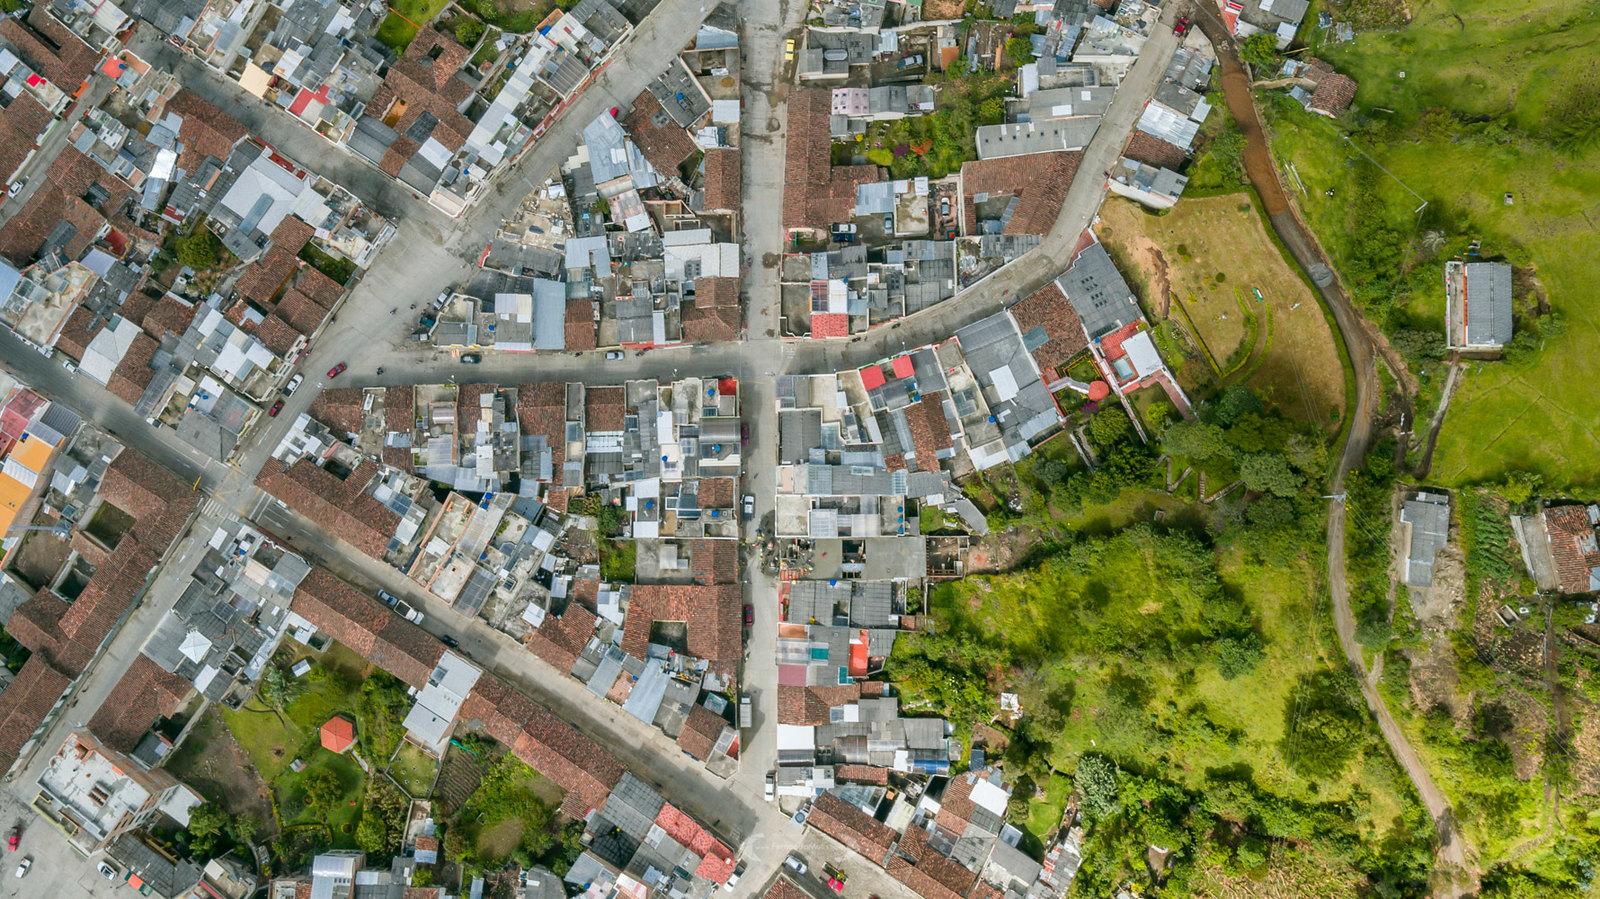 Fotografia Aérea en Colombia con Dron, Cali, Pasto, Popayan e ...